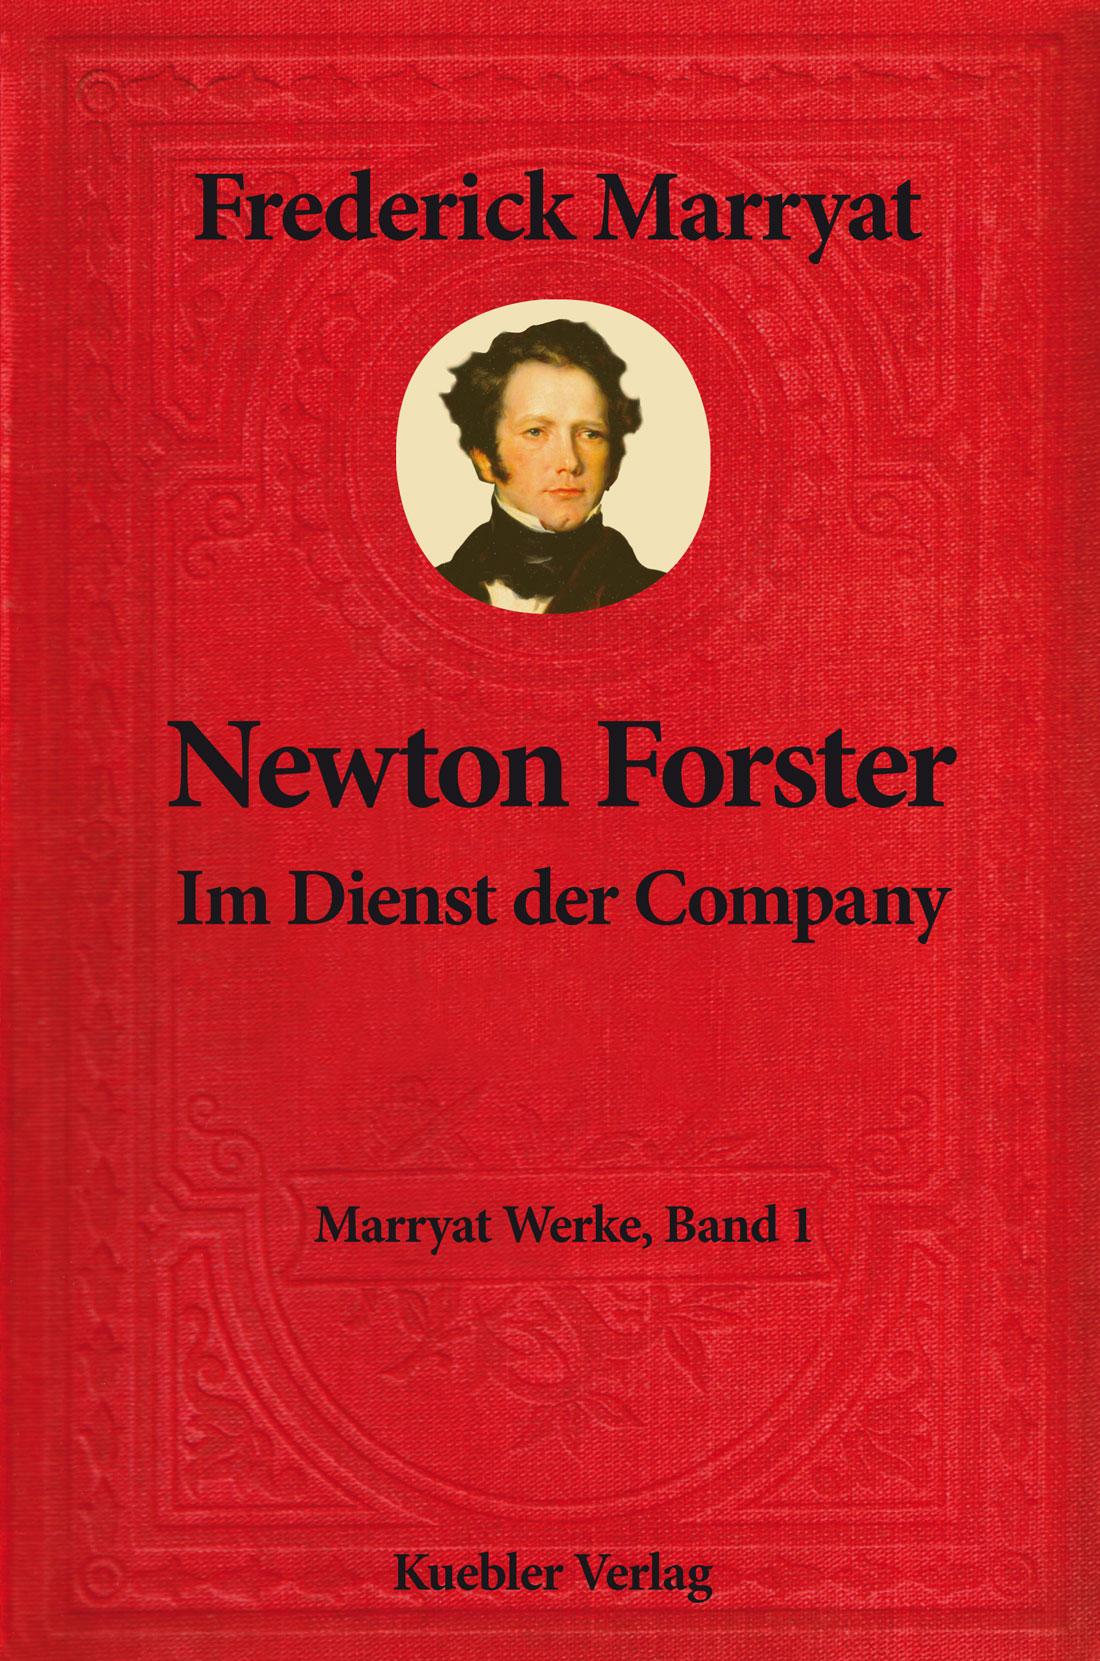 цена на Фредерик Марриет Newton Forster